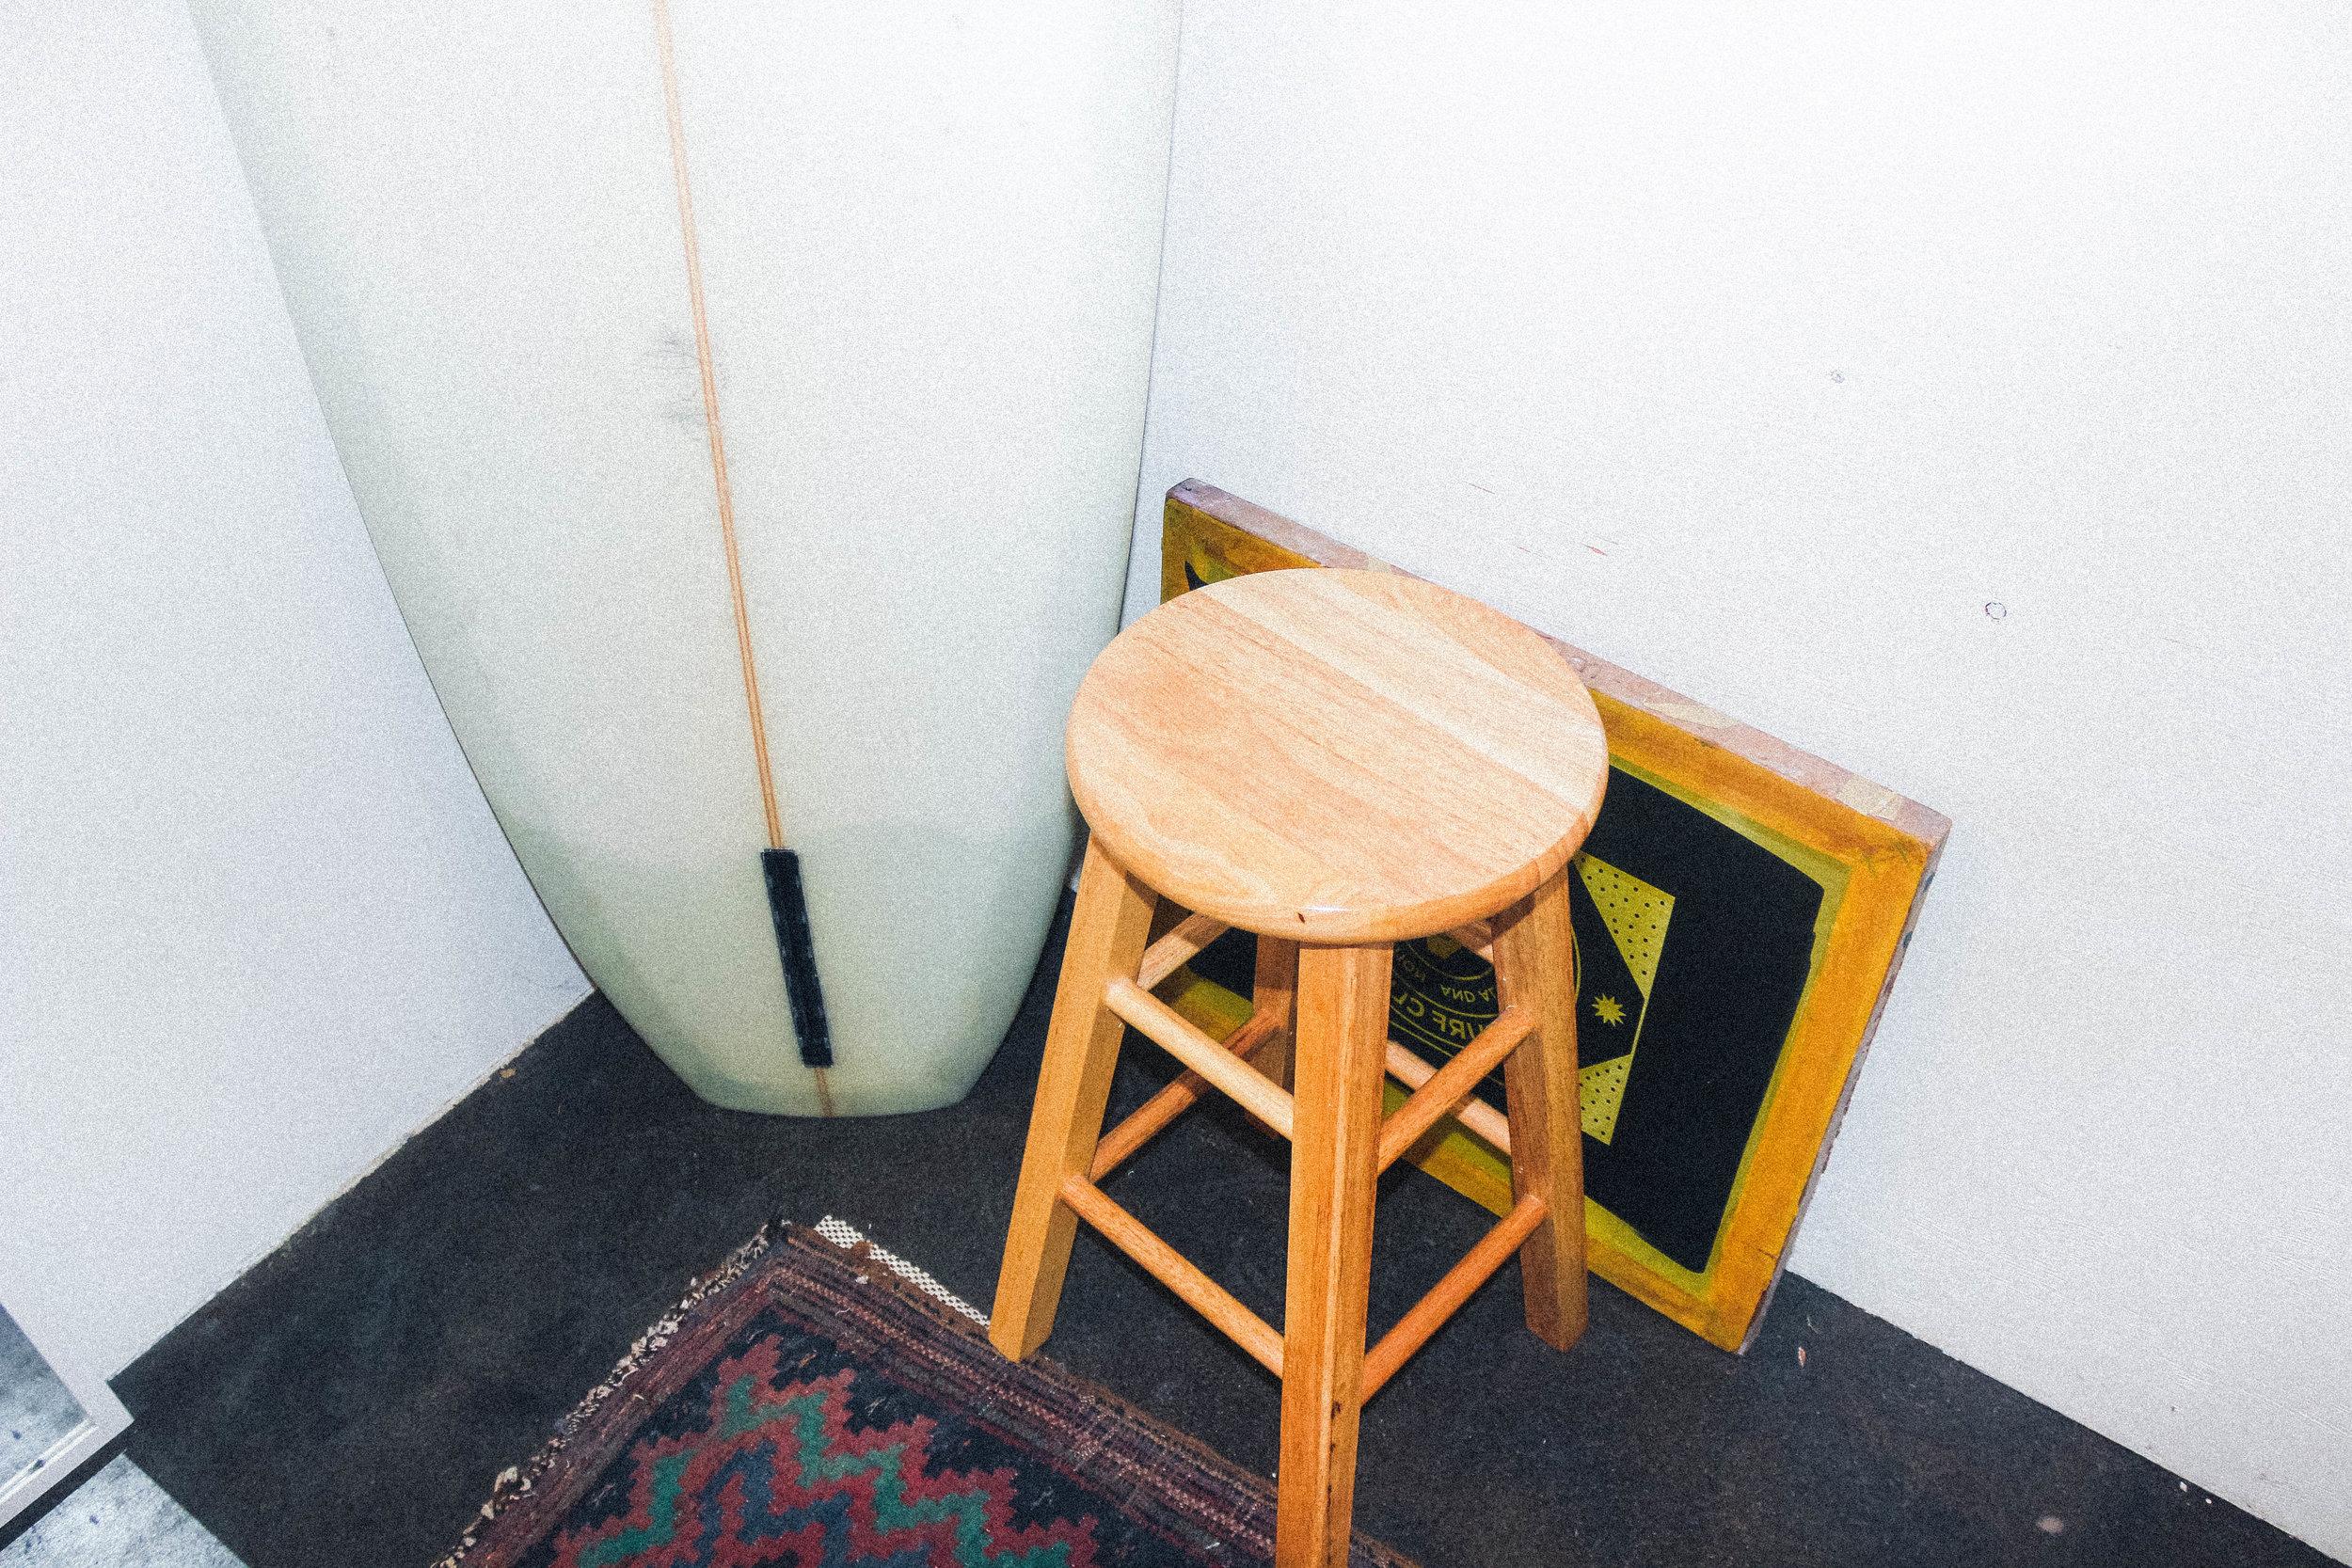 DAYDREAM SURF SHOP - TAYLORKRISTIINA.COM